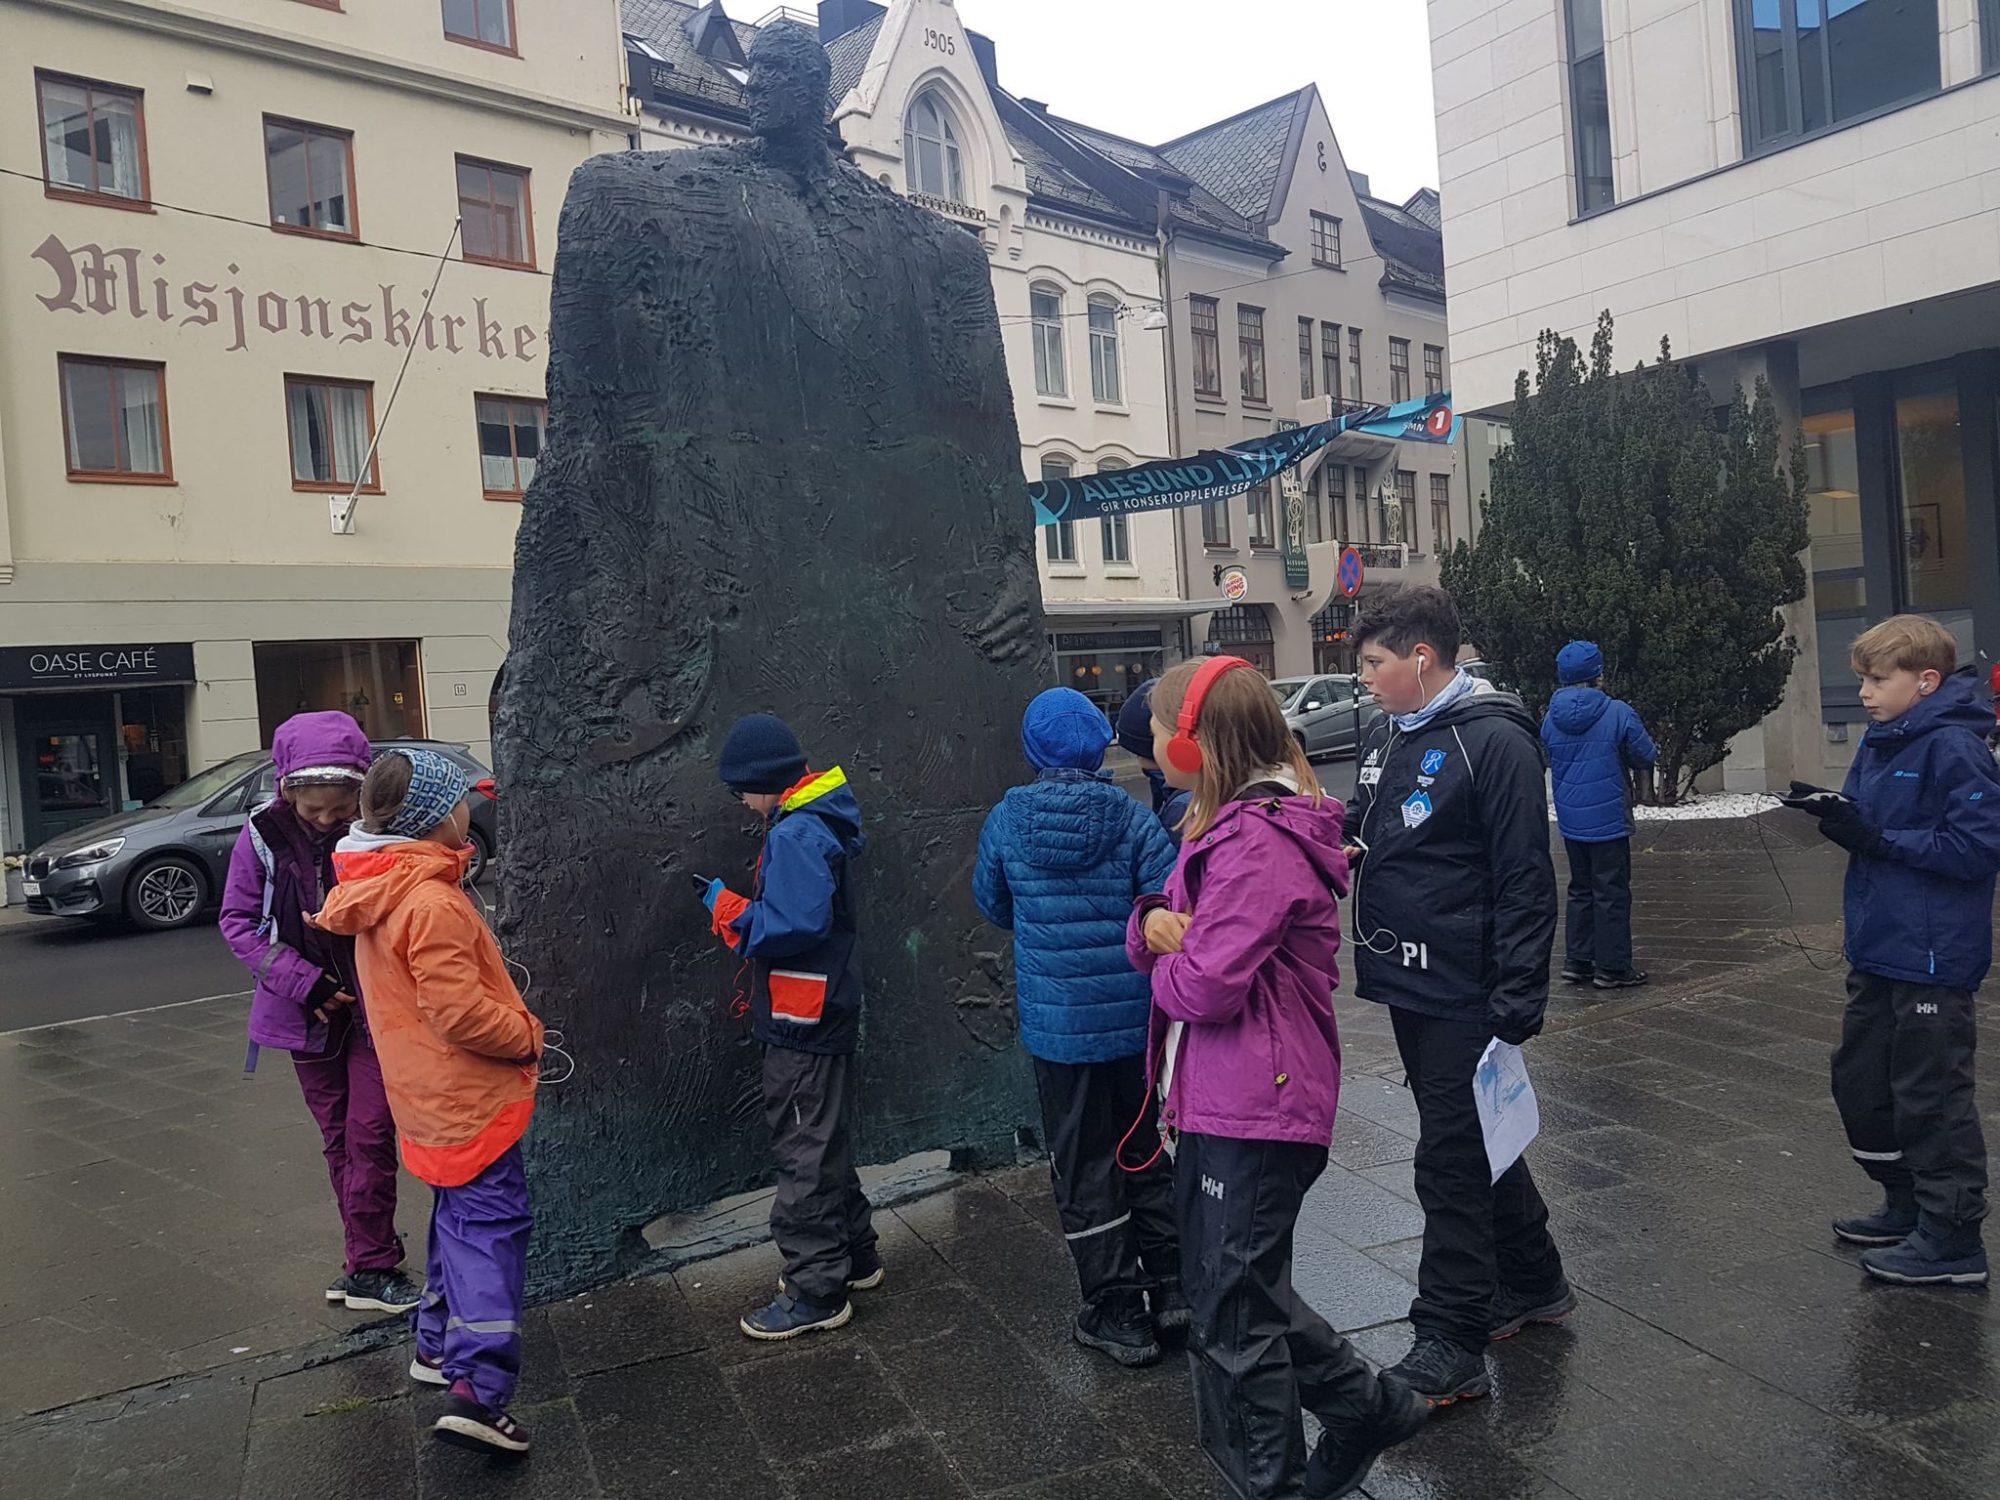 Mot-Havet-barn-statue-historie-Alesund